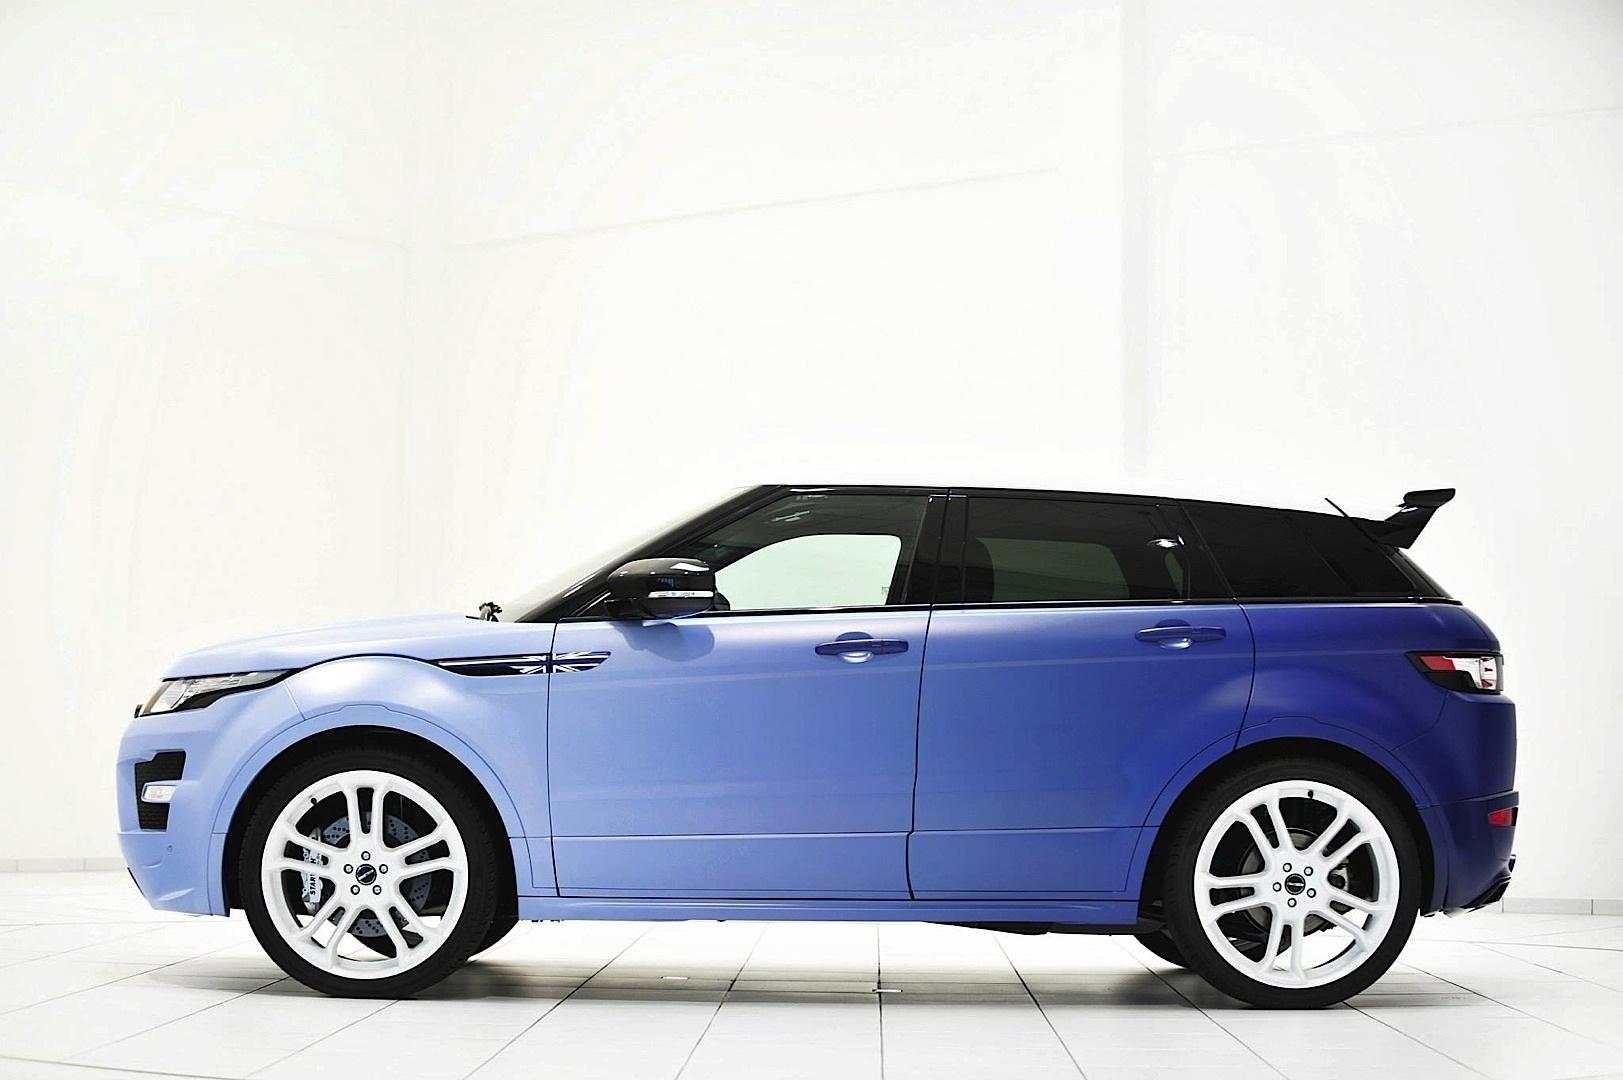 http://s1.cdn.autoevolution.com/images/news/gallery/startech-ranger-rover-evoque-lpg-heading-for-frankfurt_4.jpg?1378720514